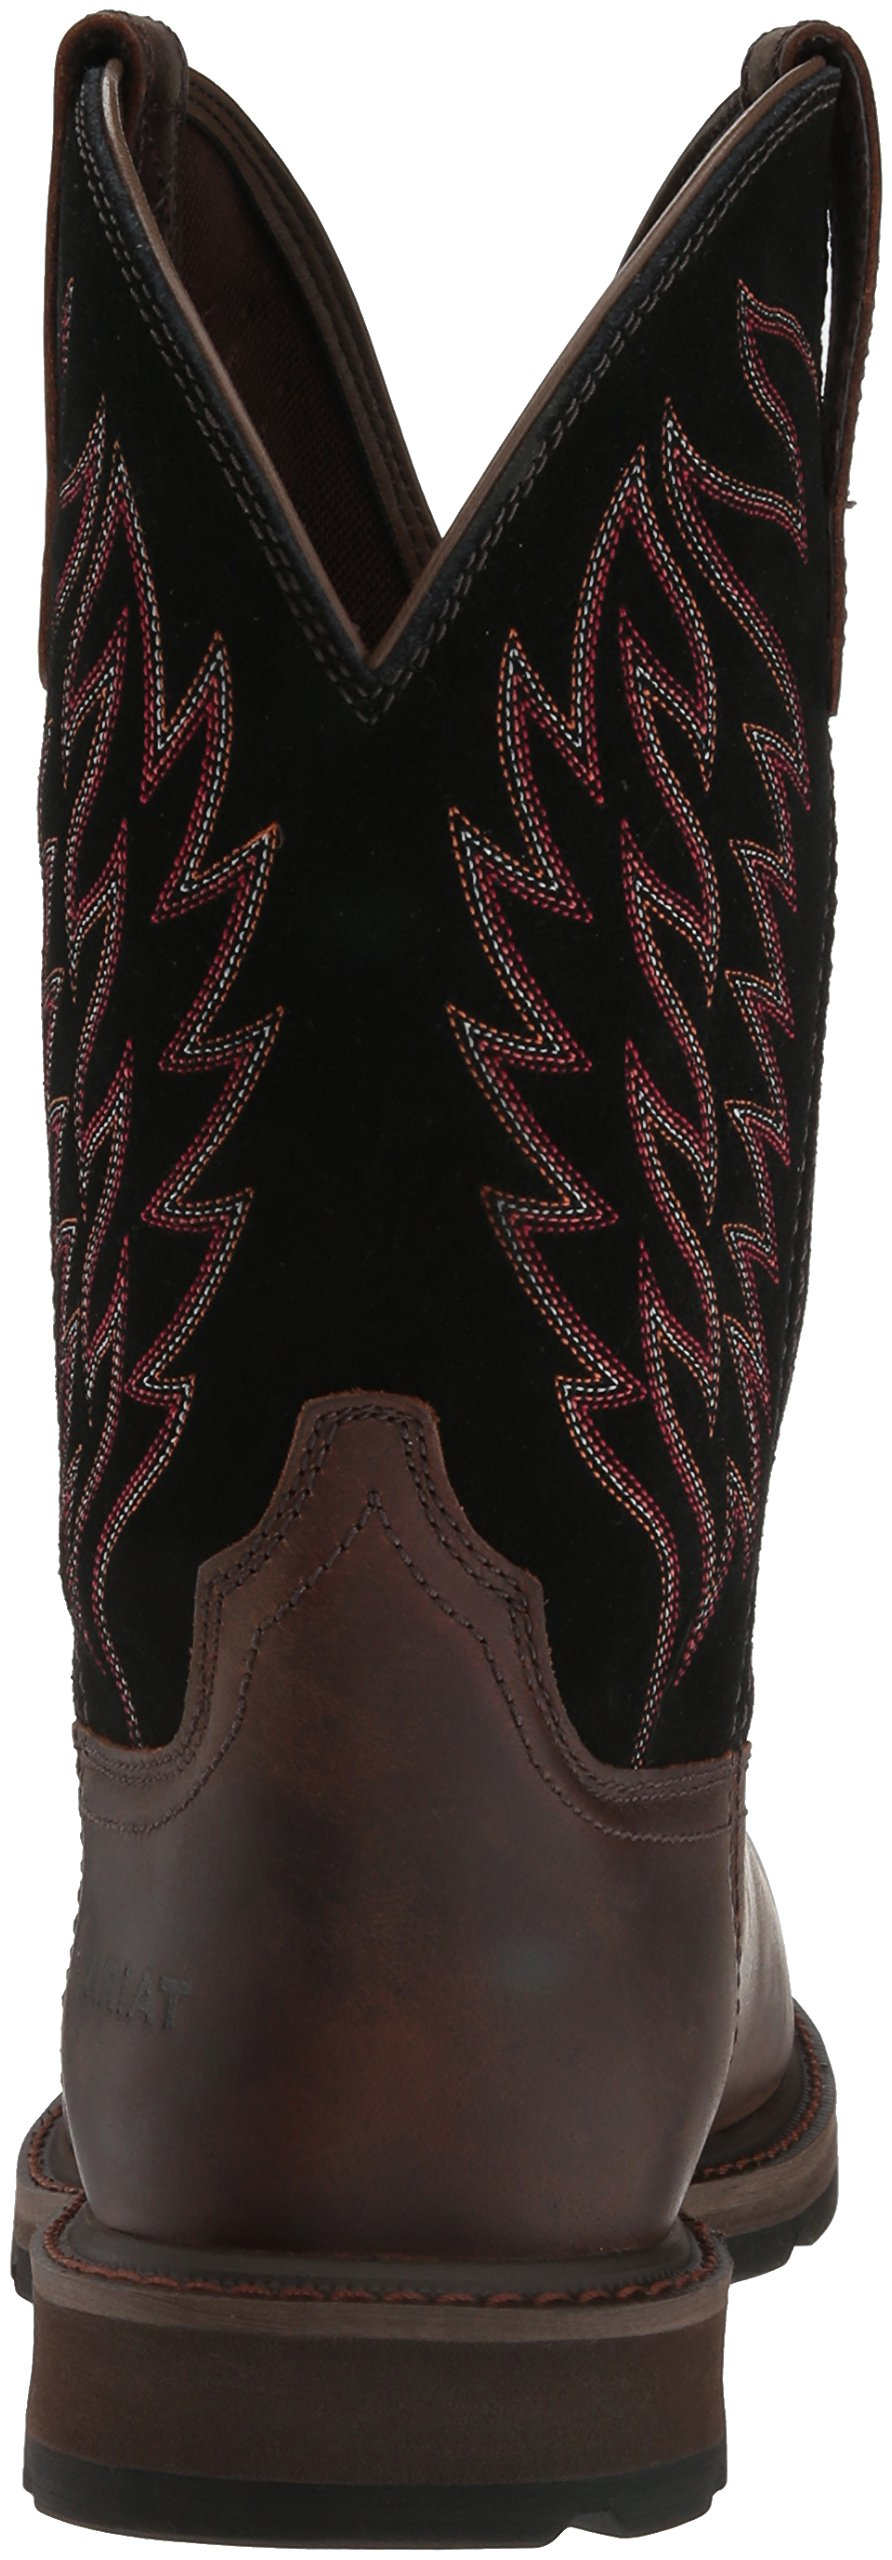 Ariat Work Men's Groundbreaker Pull-On Steel Toe Work Boot, Brown/Black, 10 D US by Ariat (Image #2)